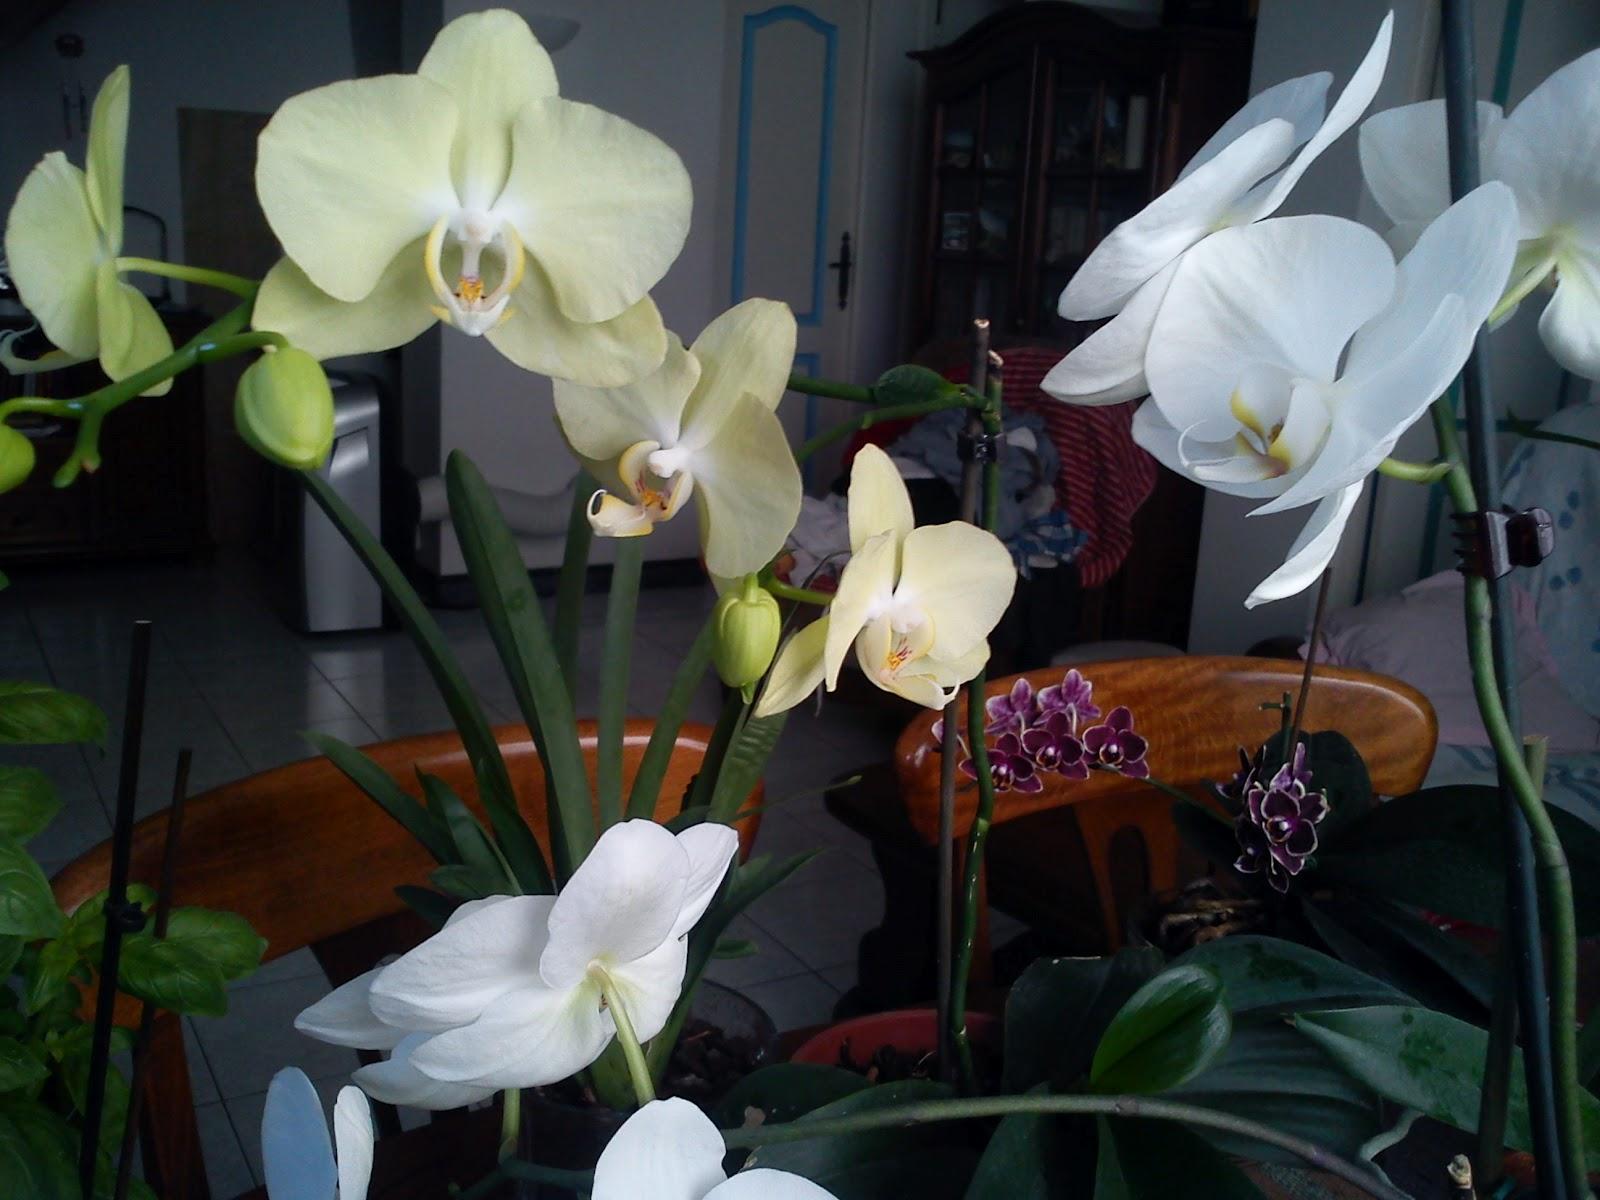 http://3.bp.blogspot.com/-q9guy1fMk40/UABhrRYhddI/AAAAAAAAAUE/m7ngSx9N_Nw/s1600/Phalaenopsis+yellow+treasure+et+blanche.JPG